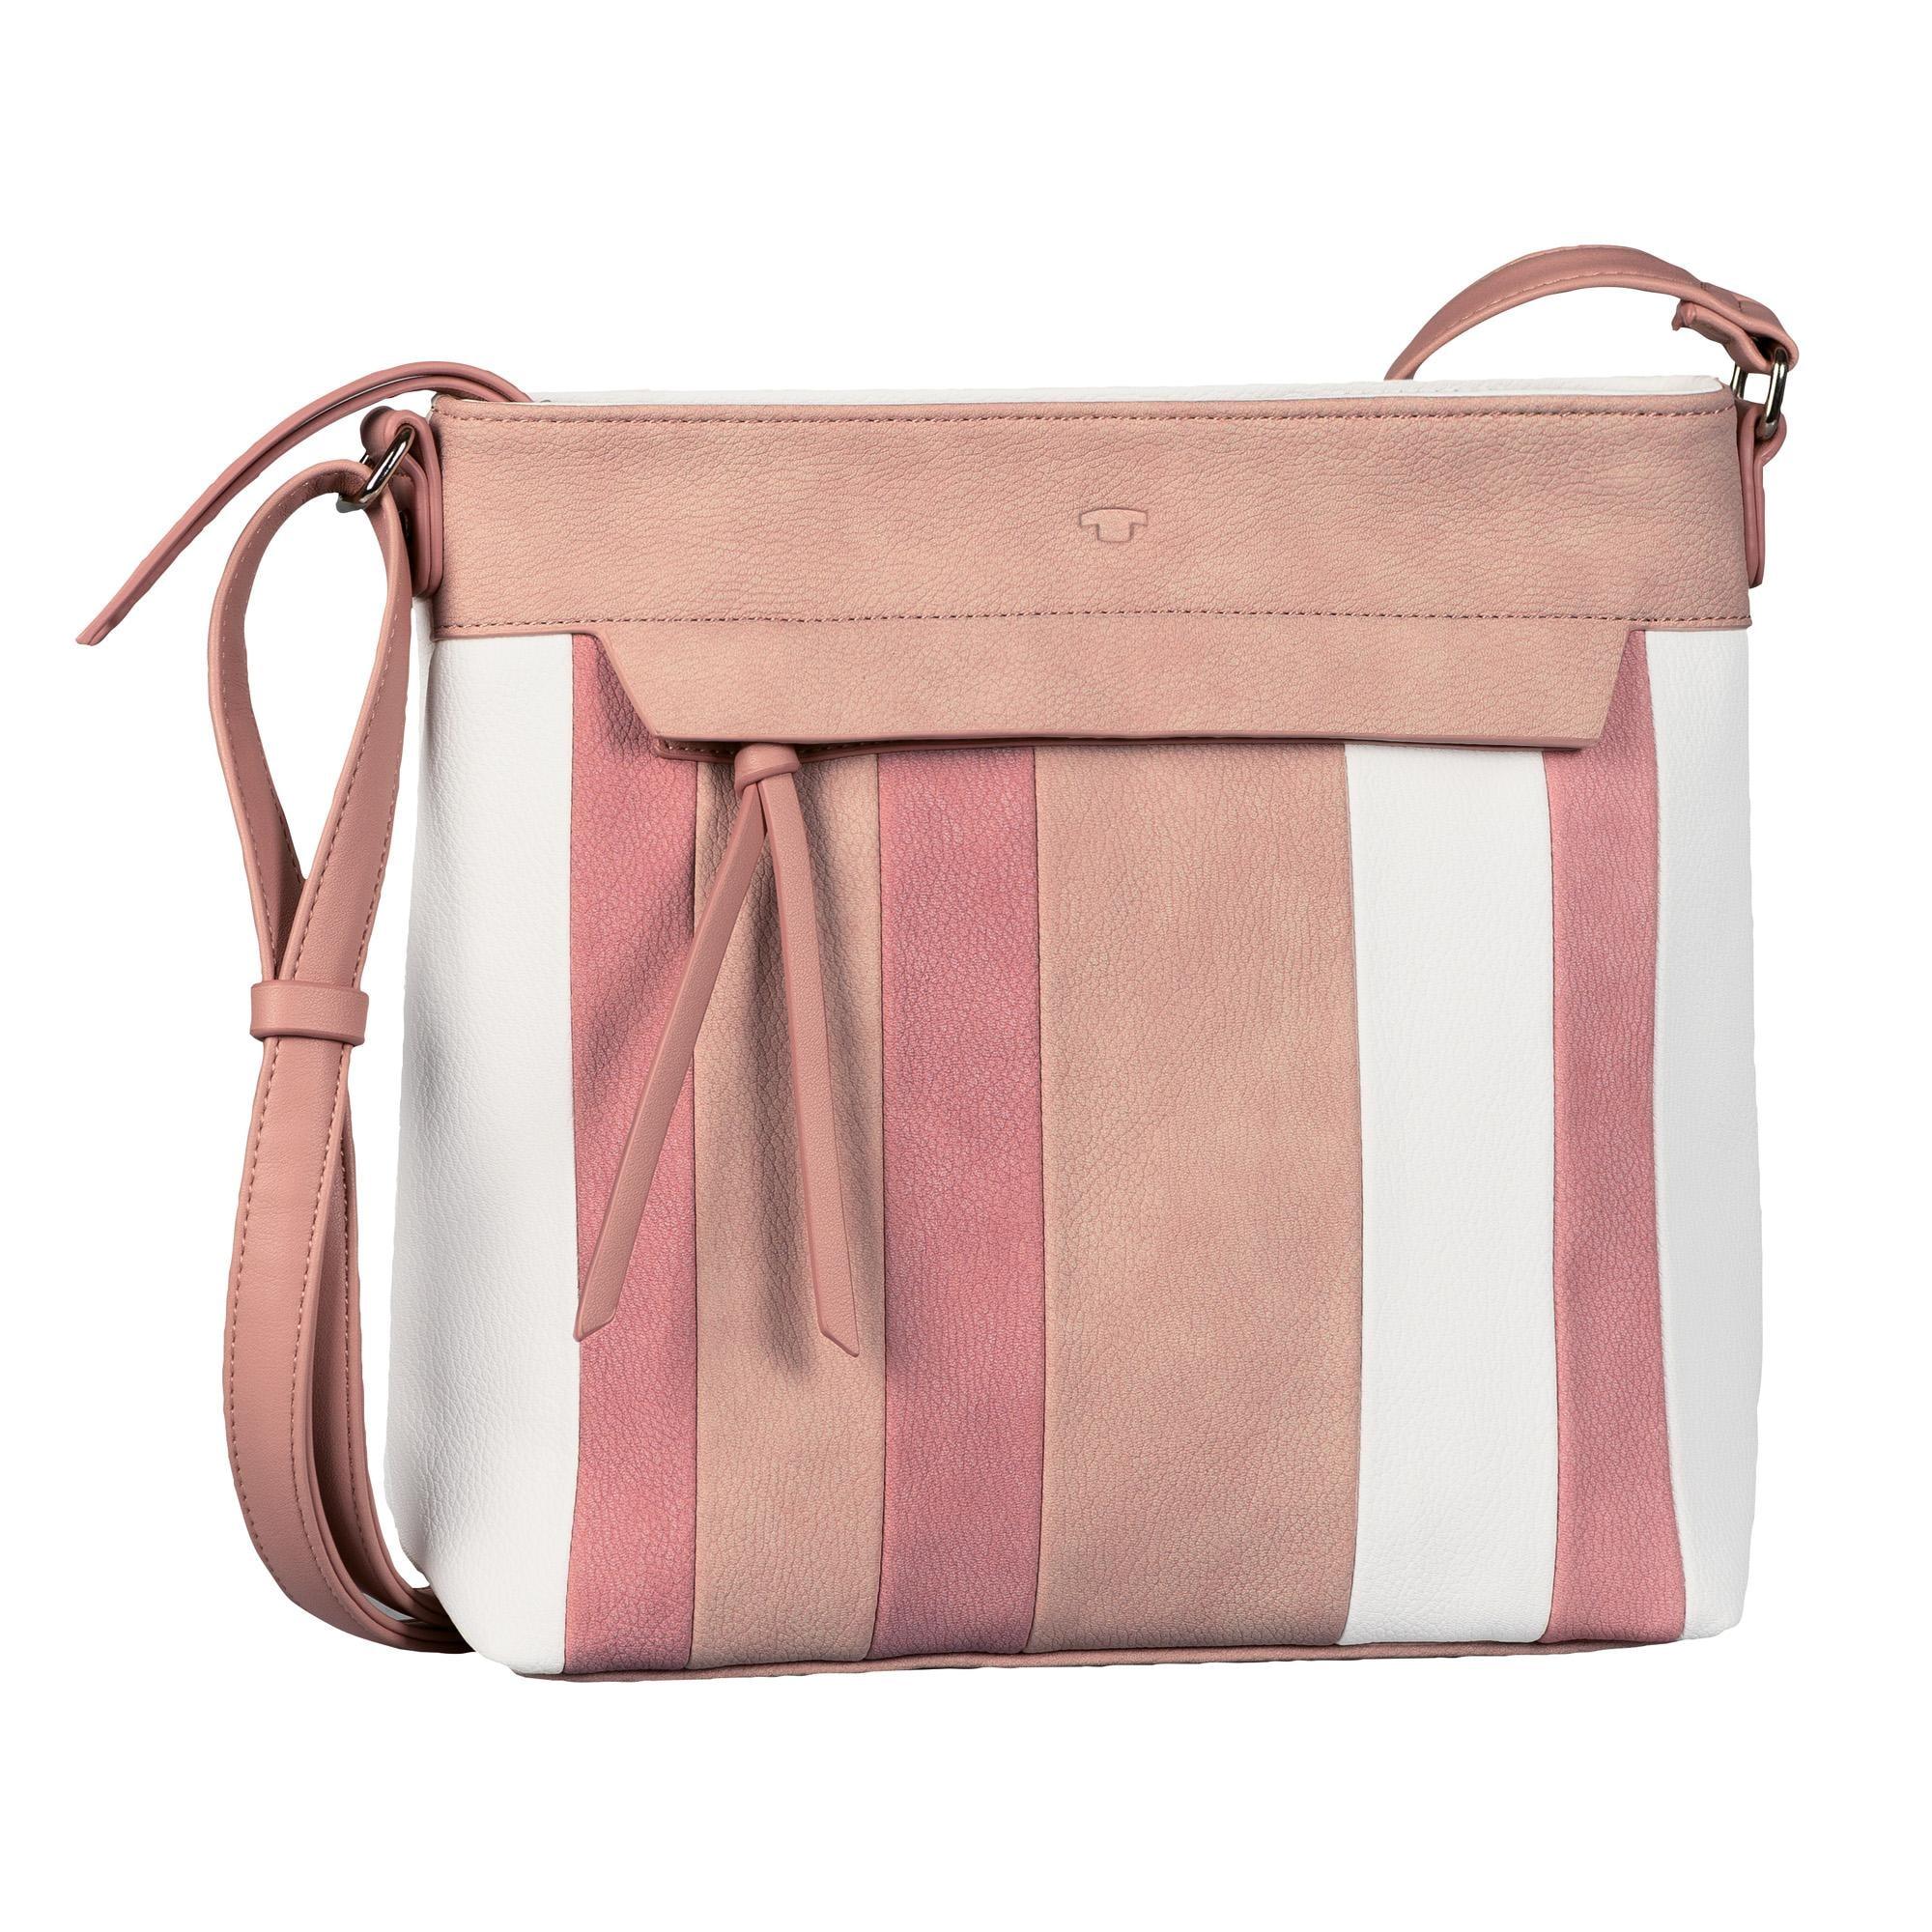 Rabatt Damen > Accessoires > Taschen